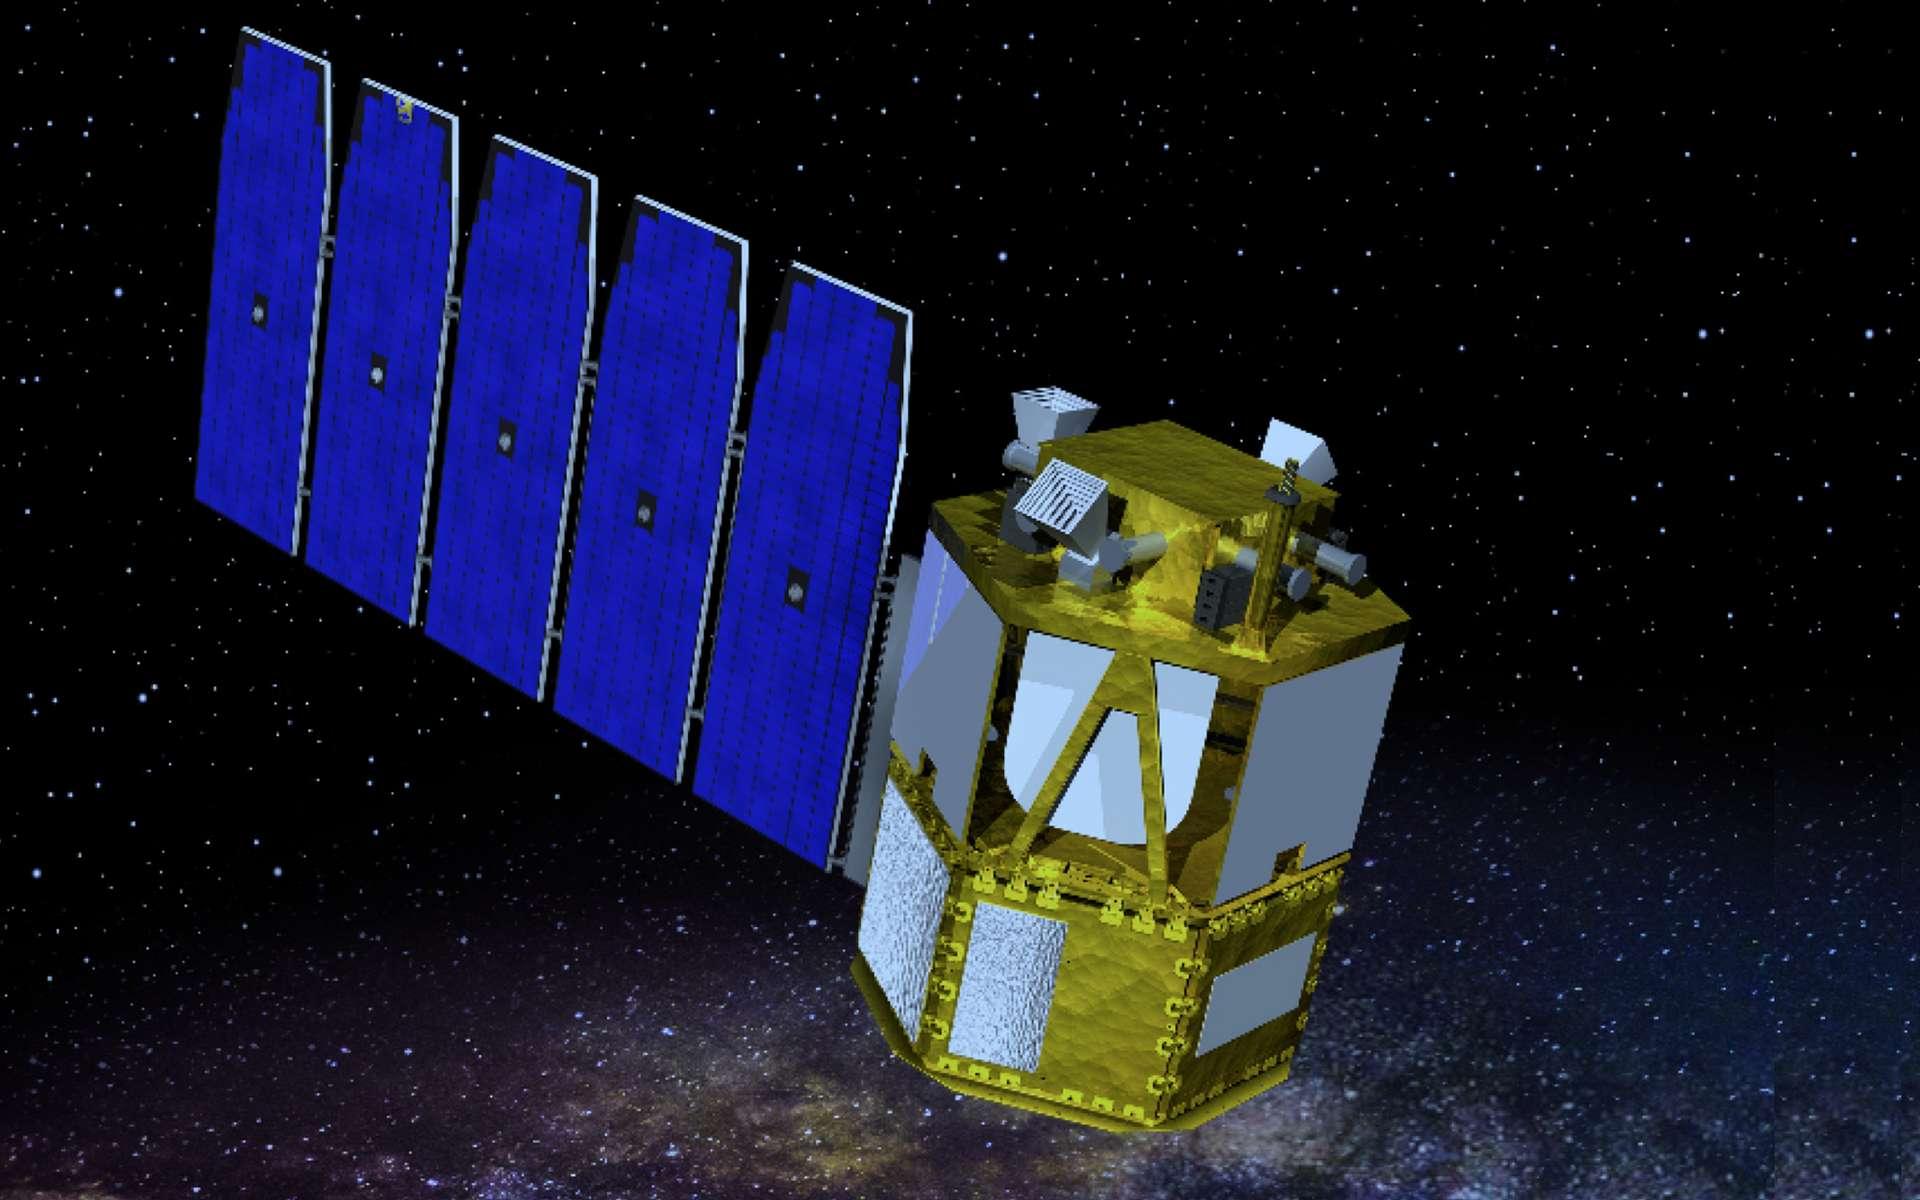 Étude conceptuelle du futur satellite Cosi de la Nasa. © UC Berkeley